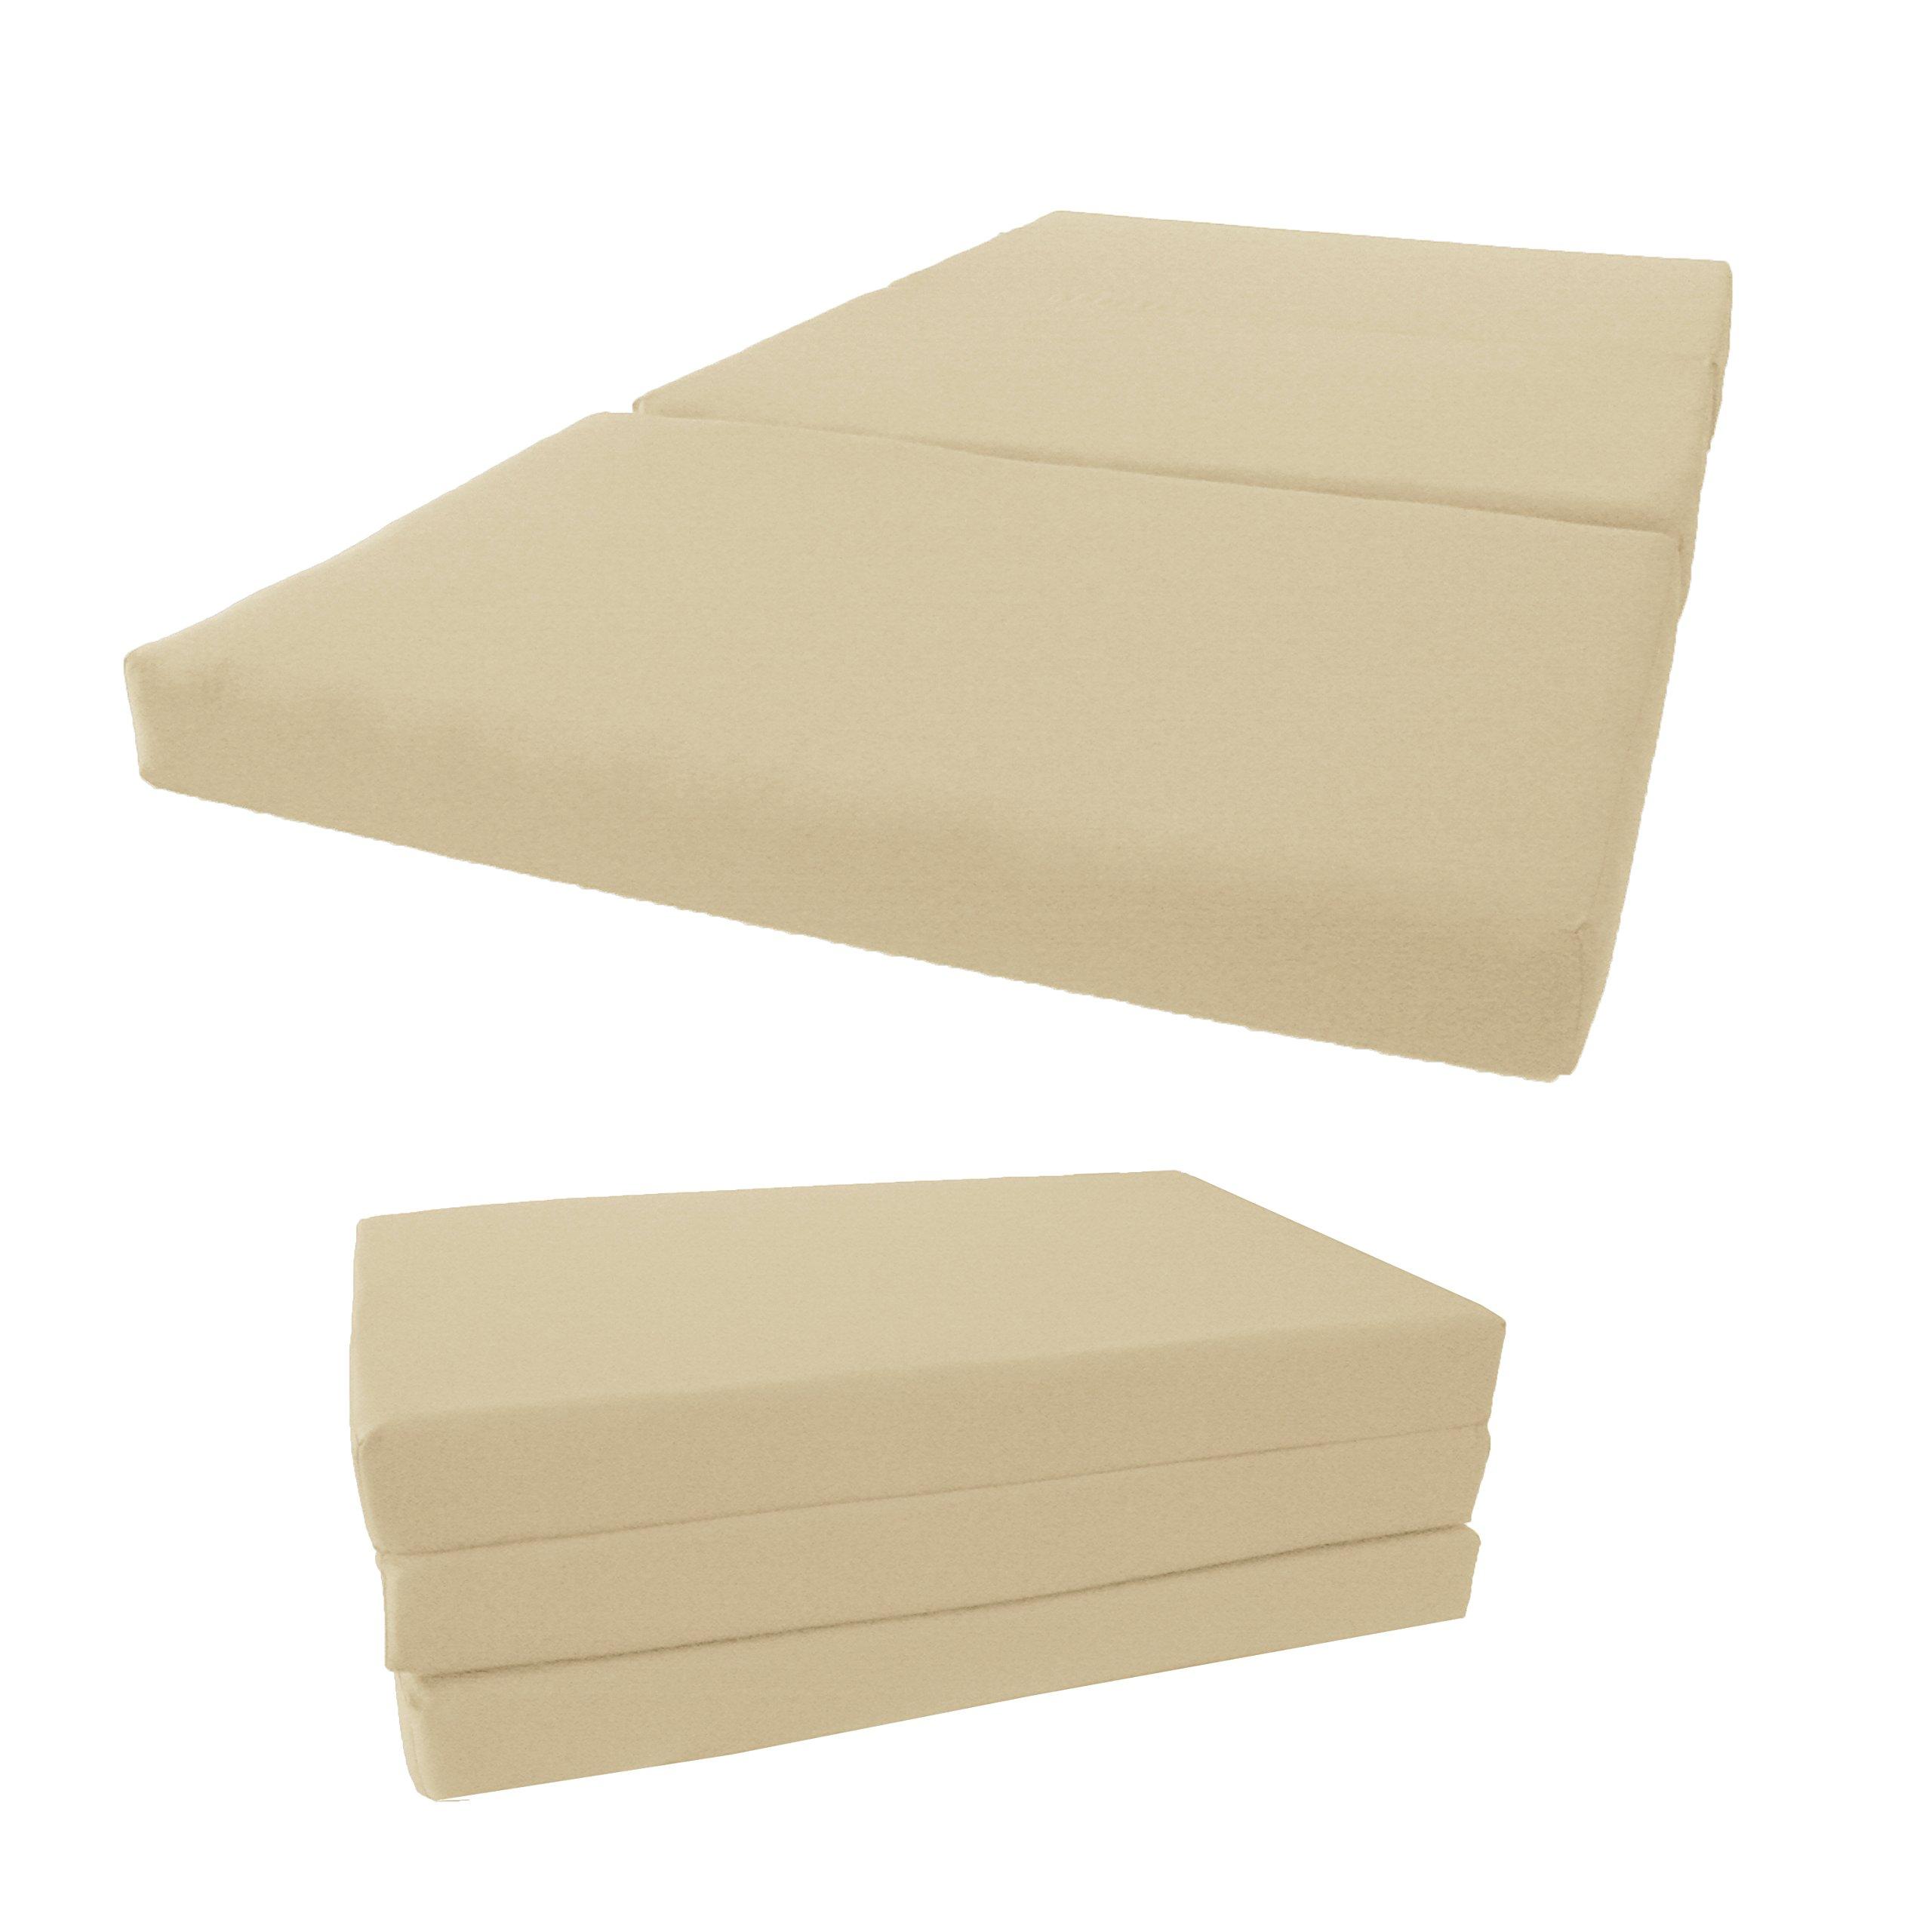 Brand New Shikibuton Tri Fold Foam Beds, Tri-Fold Bed, High Density 1.8 lbs Foam, Twin Size, Full, Queen Folding Mattresses. (Twin Size 4x39x75, Tan)